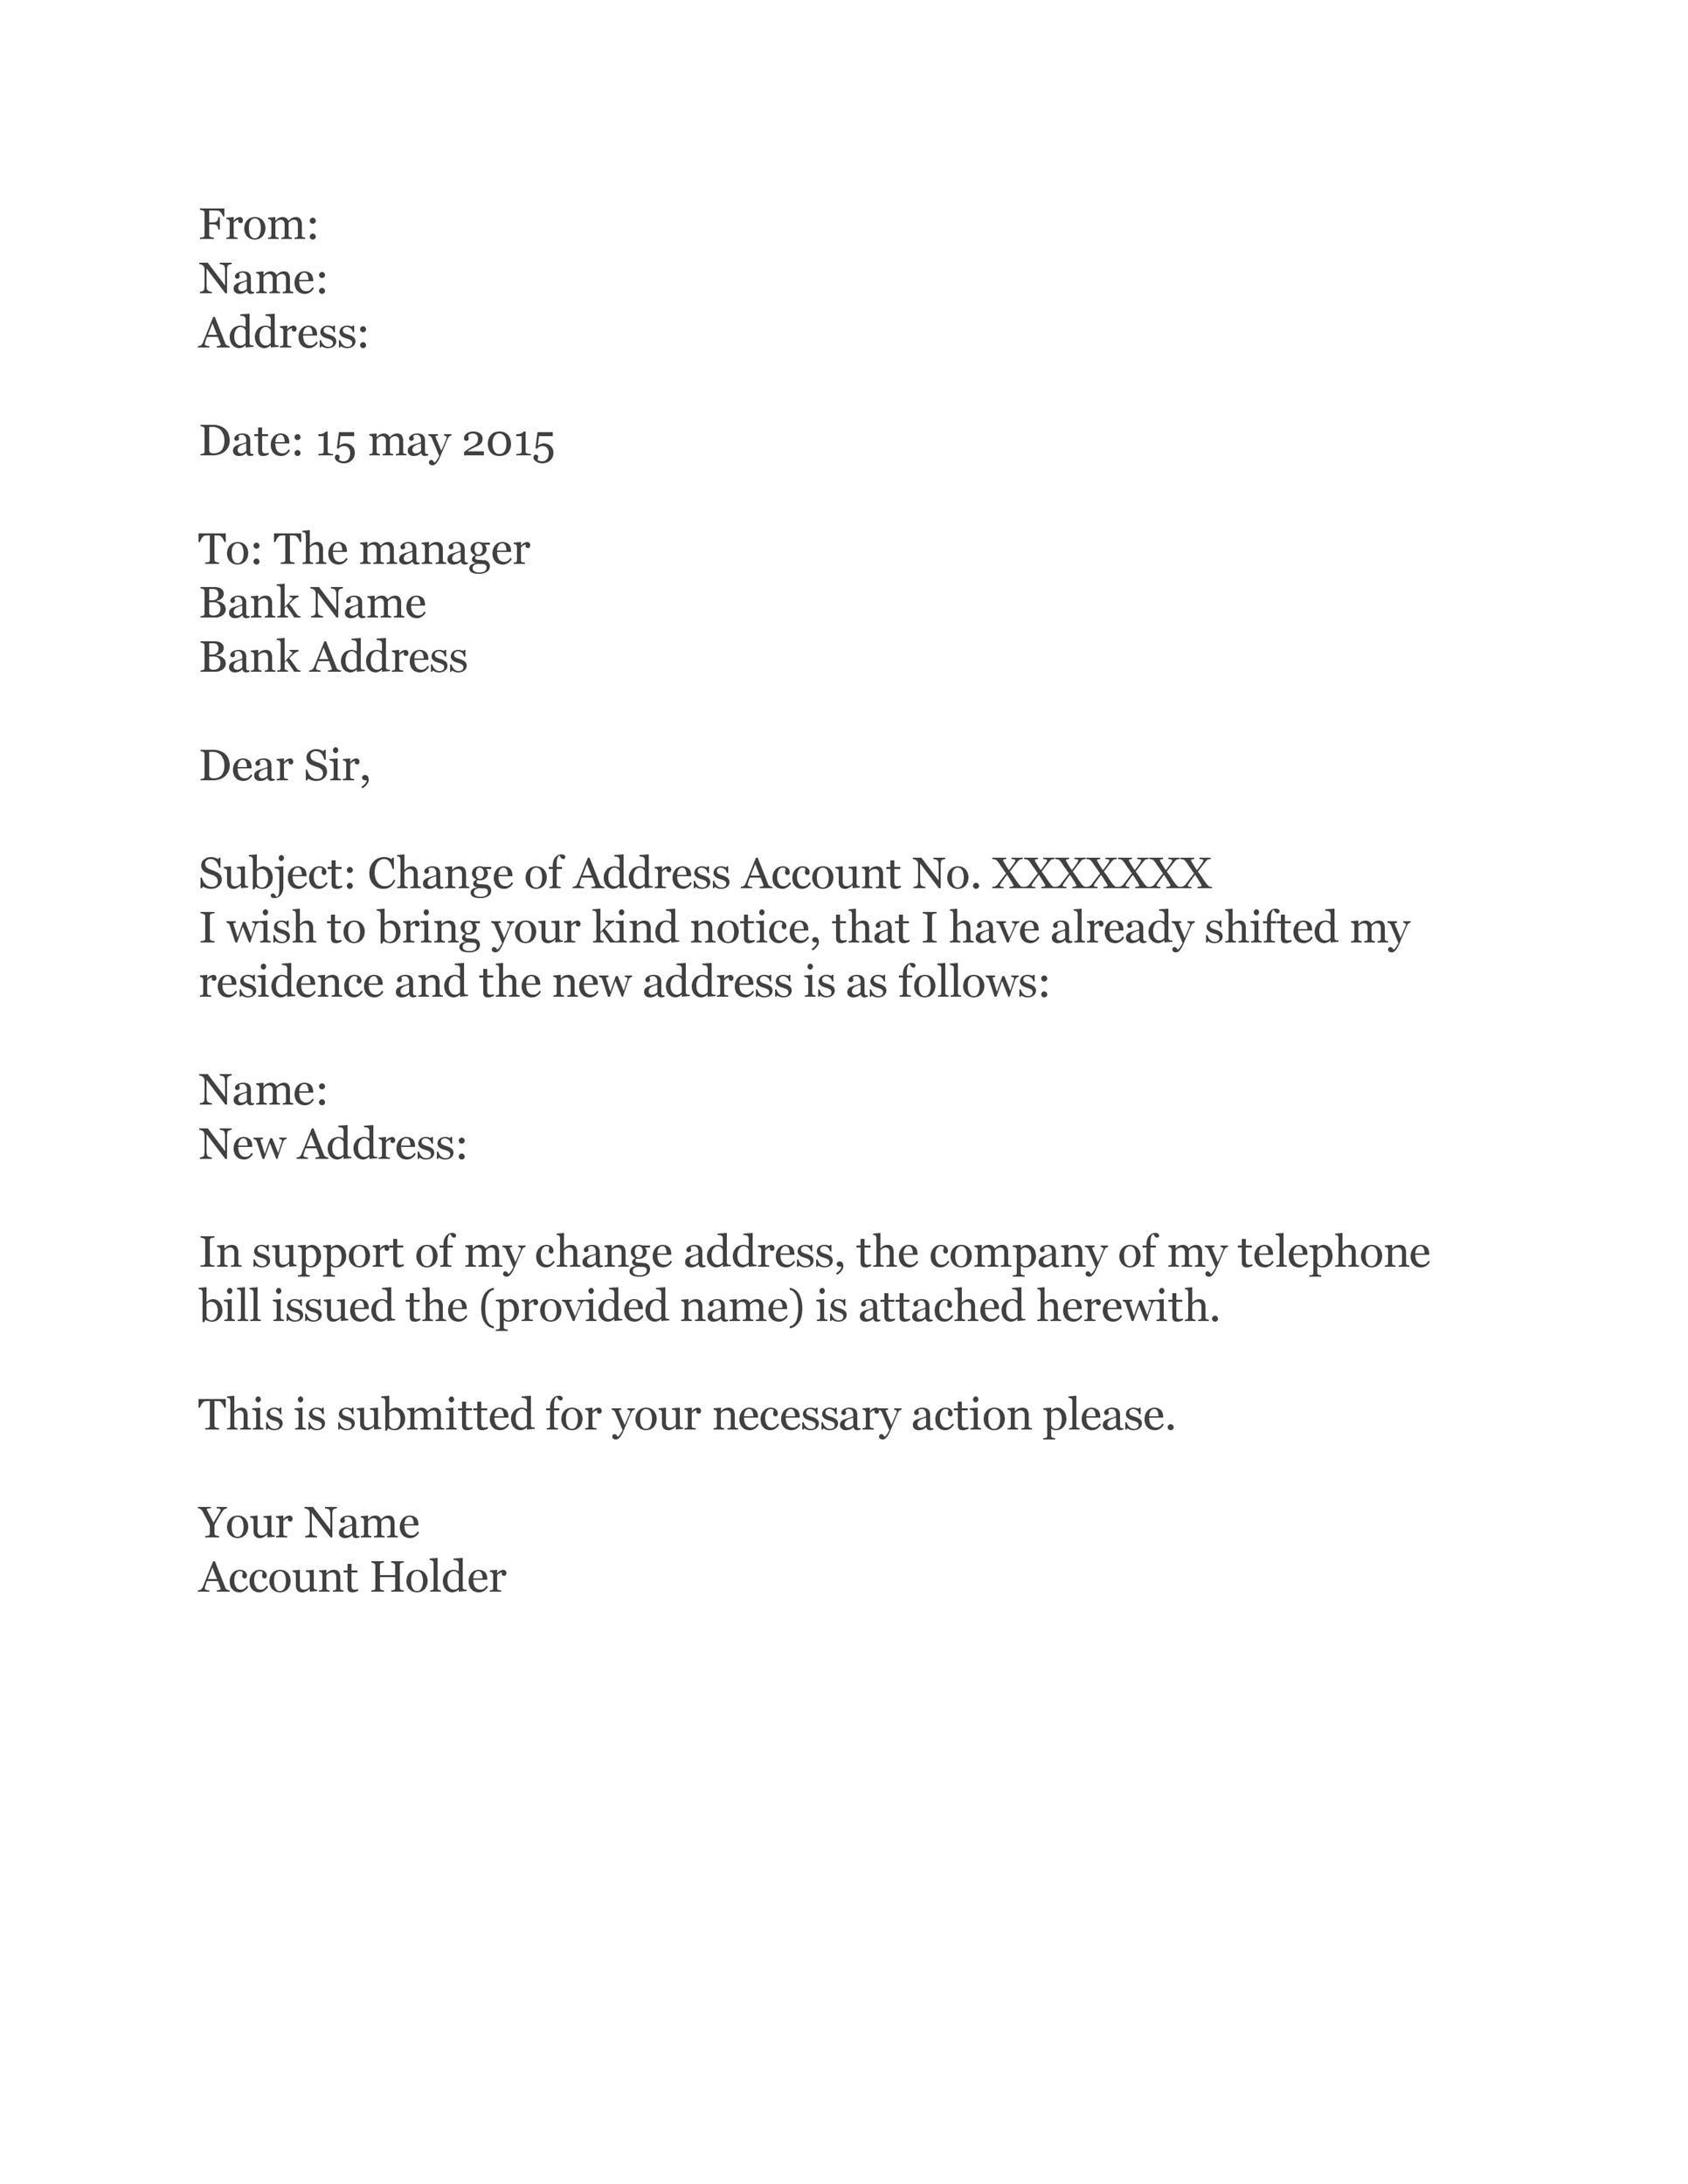 Free change of address letter 23